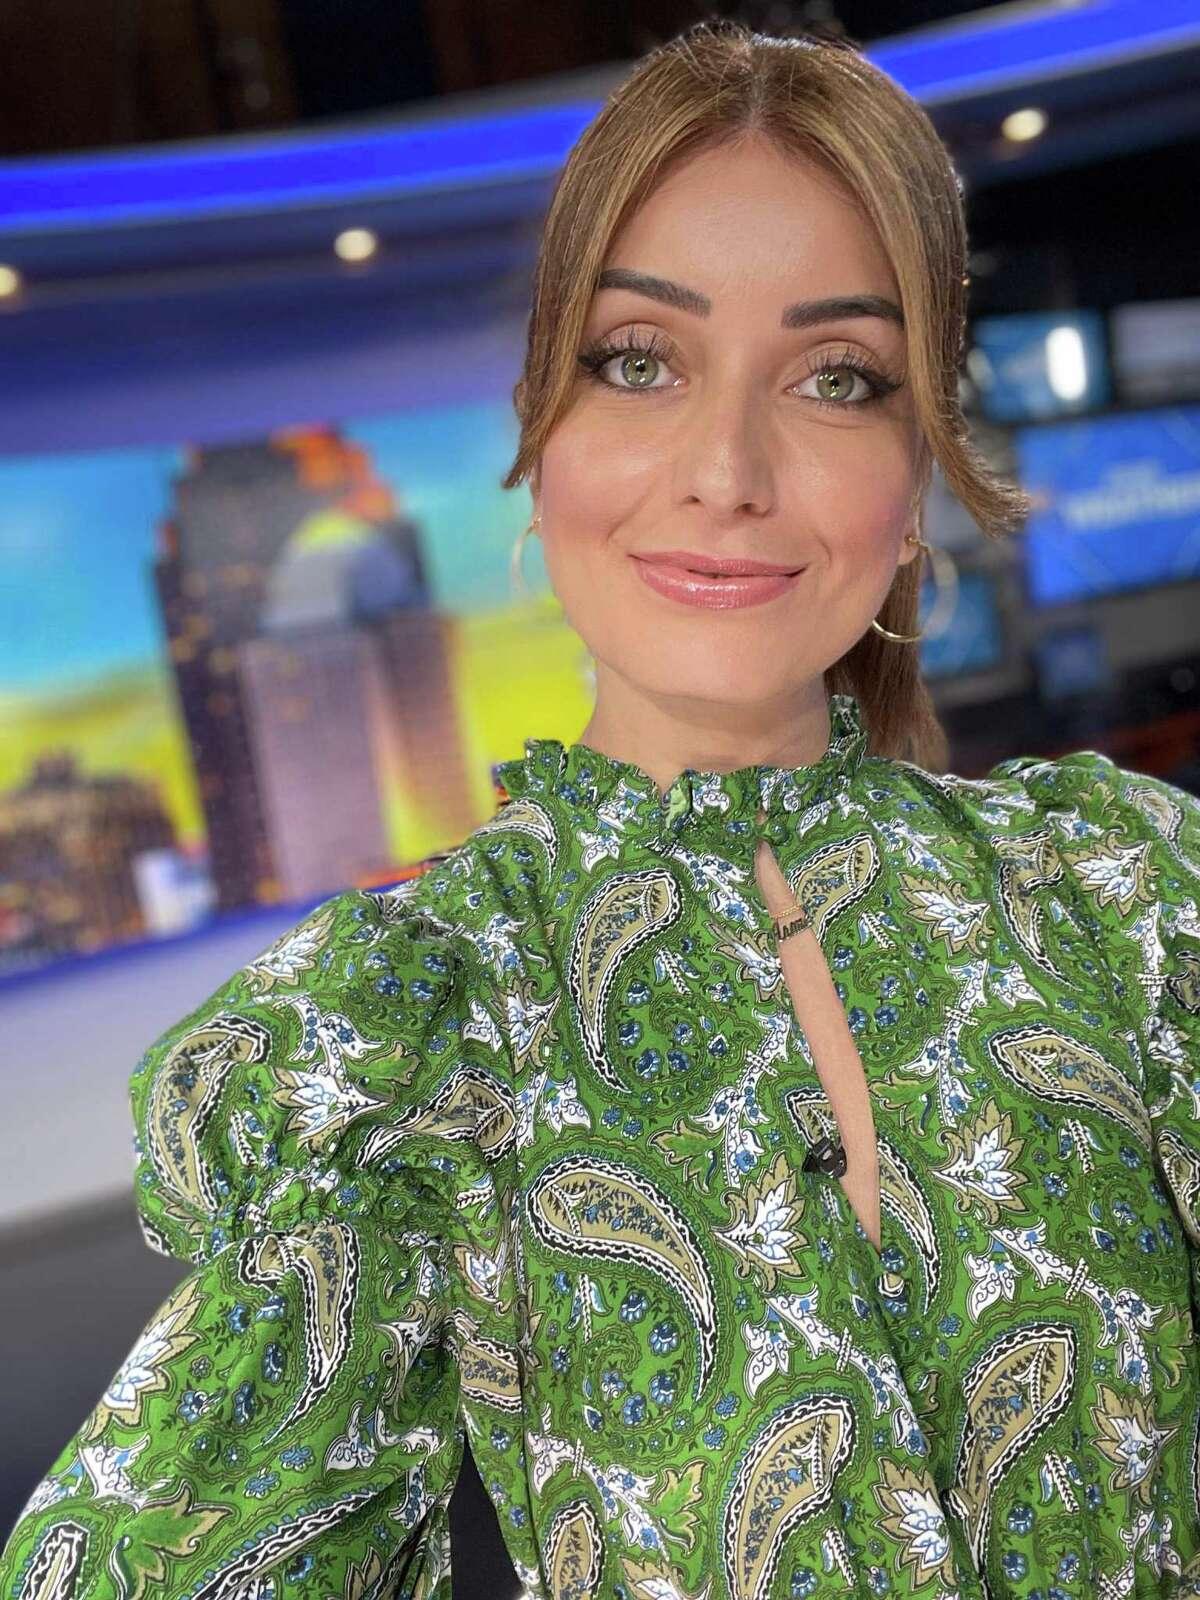 Roma Villavicencio is the host of KENS-TV's